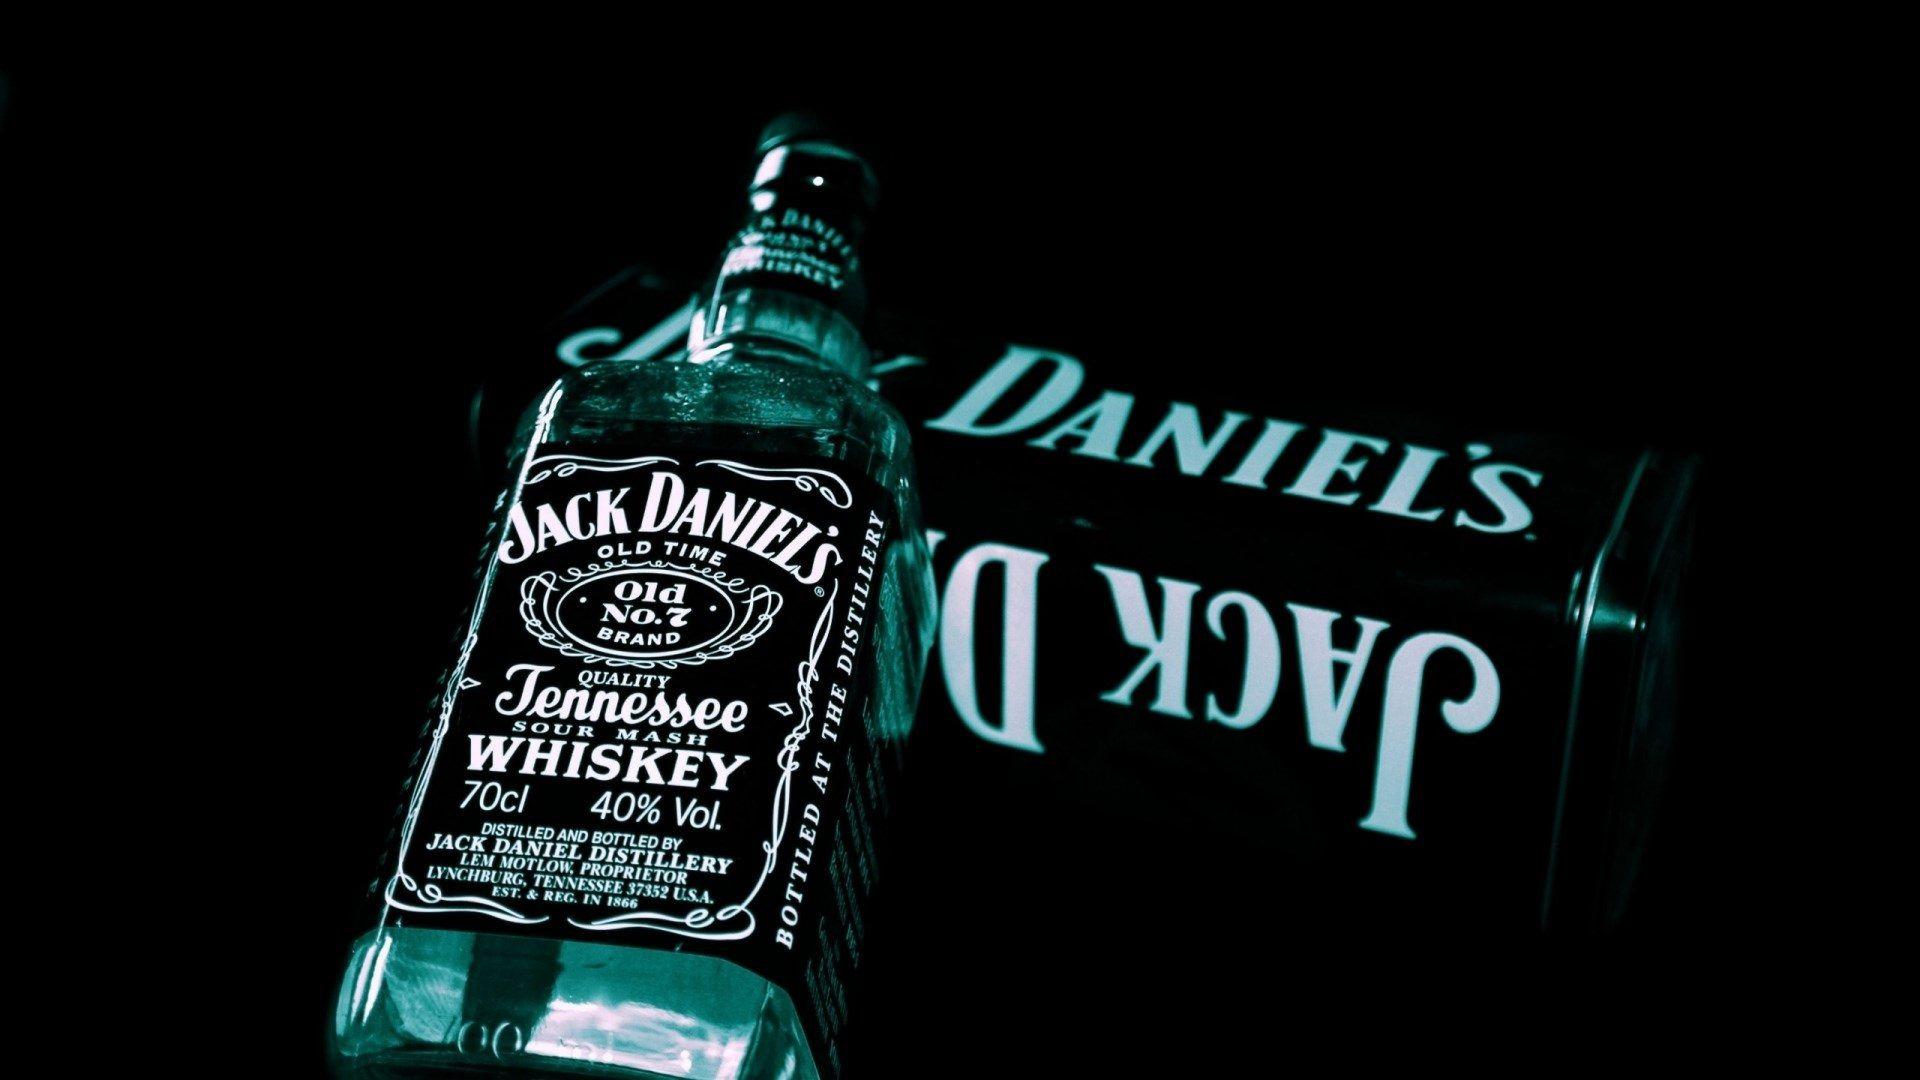 1920x1080 Jack Daniels Wallpaper Screensaver Whiskey Jack Daniels Jack Daniels Black